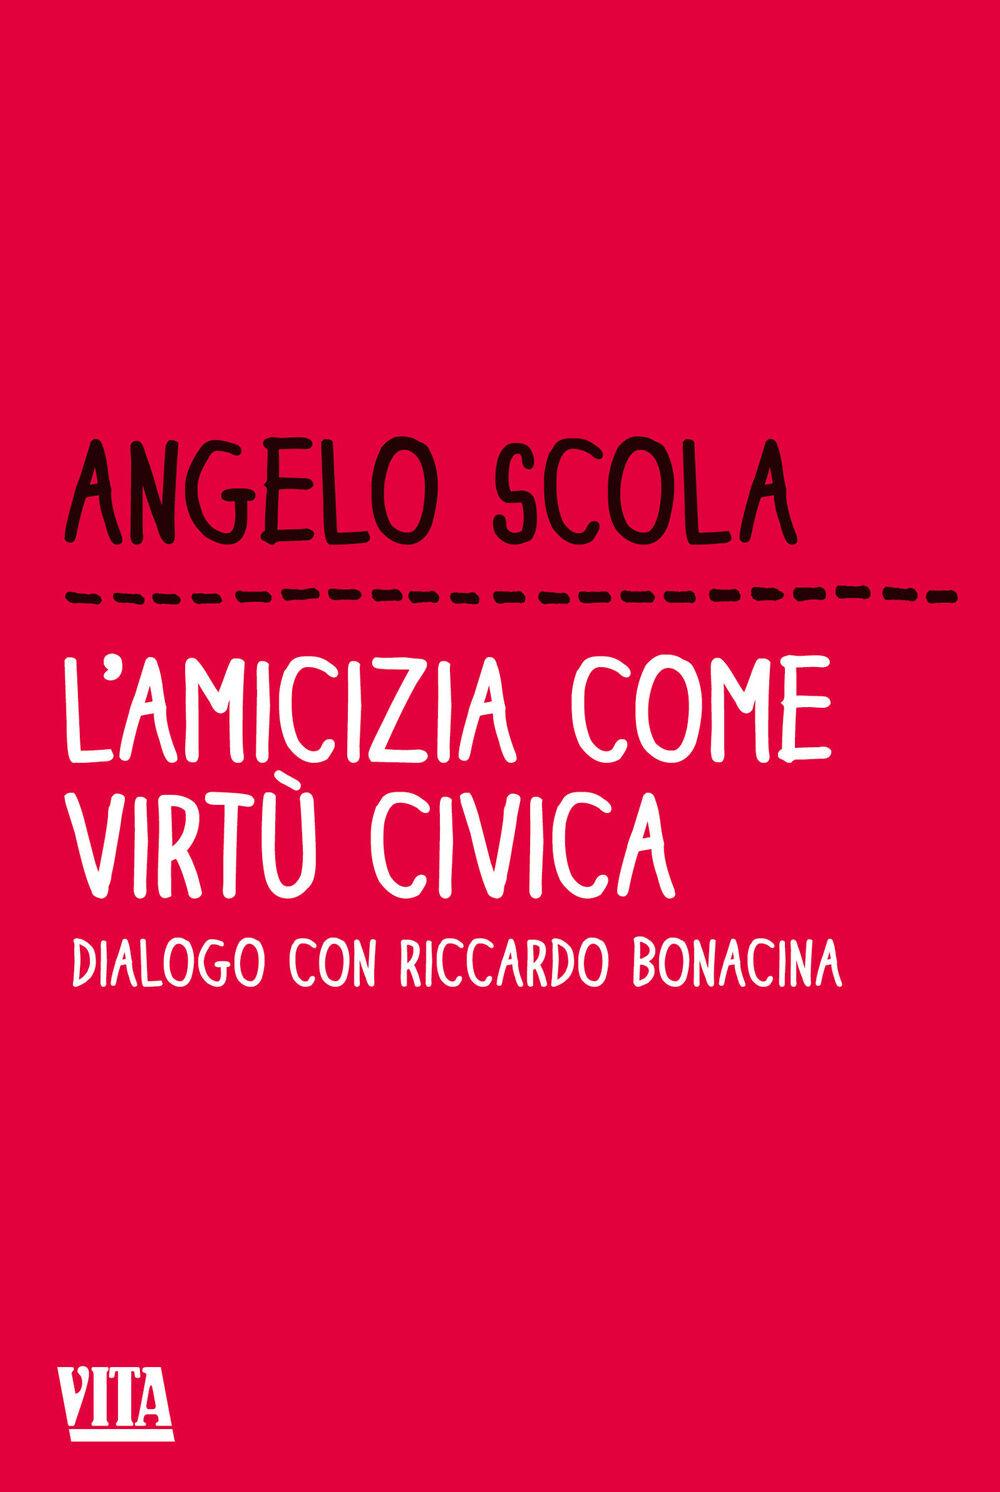 L' amicizia come virtù civica. Dialogo con Riccardo Bonacina